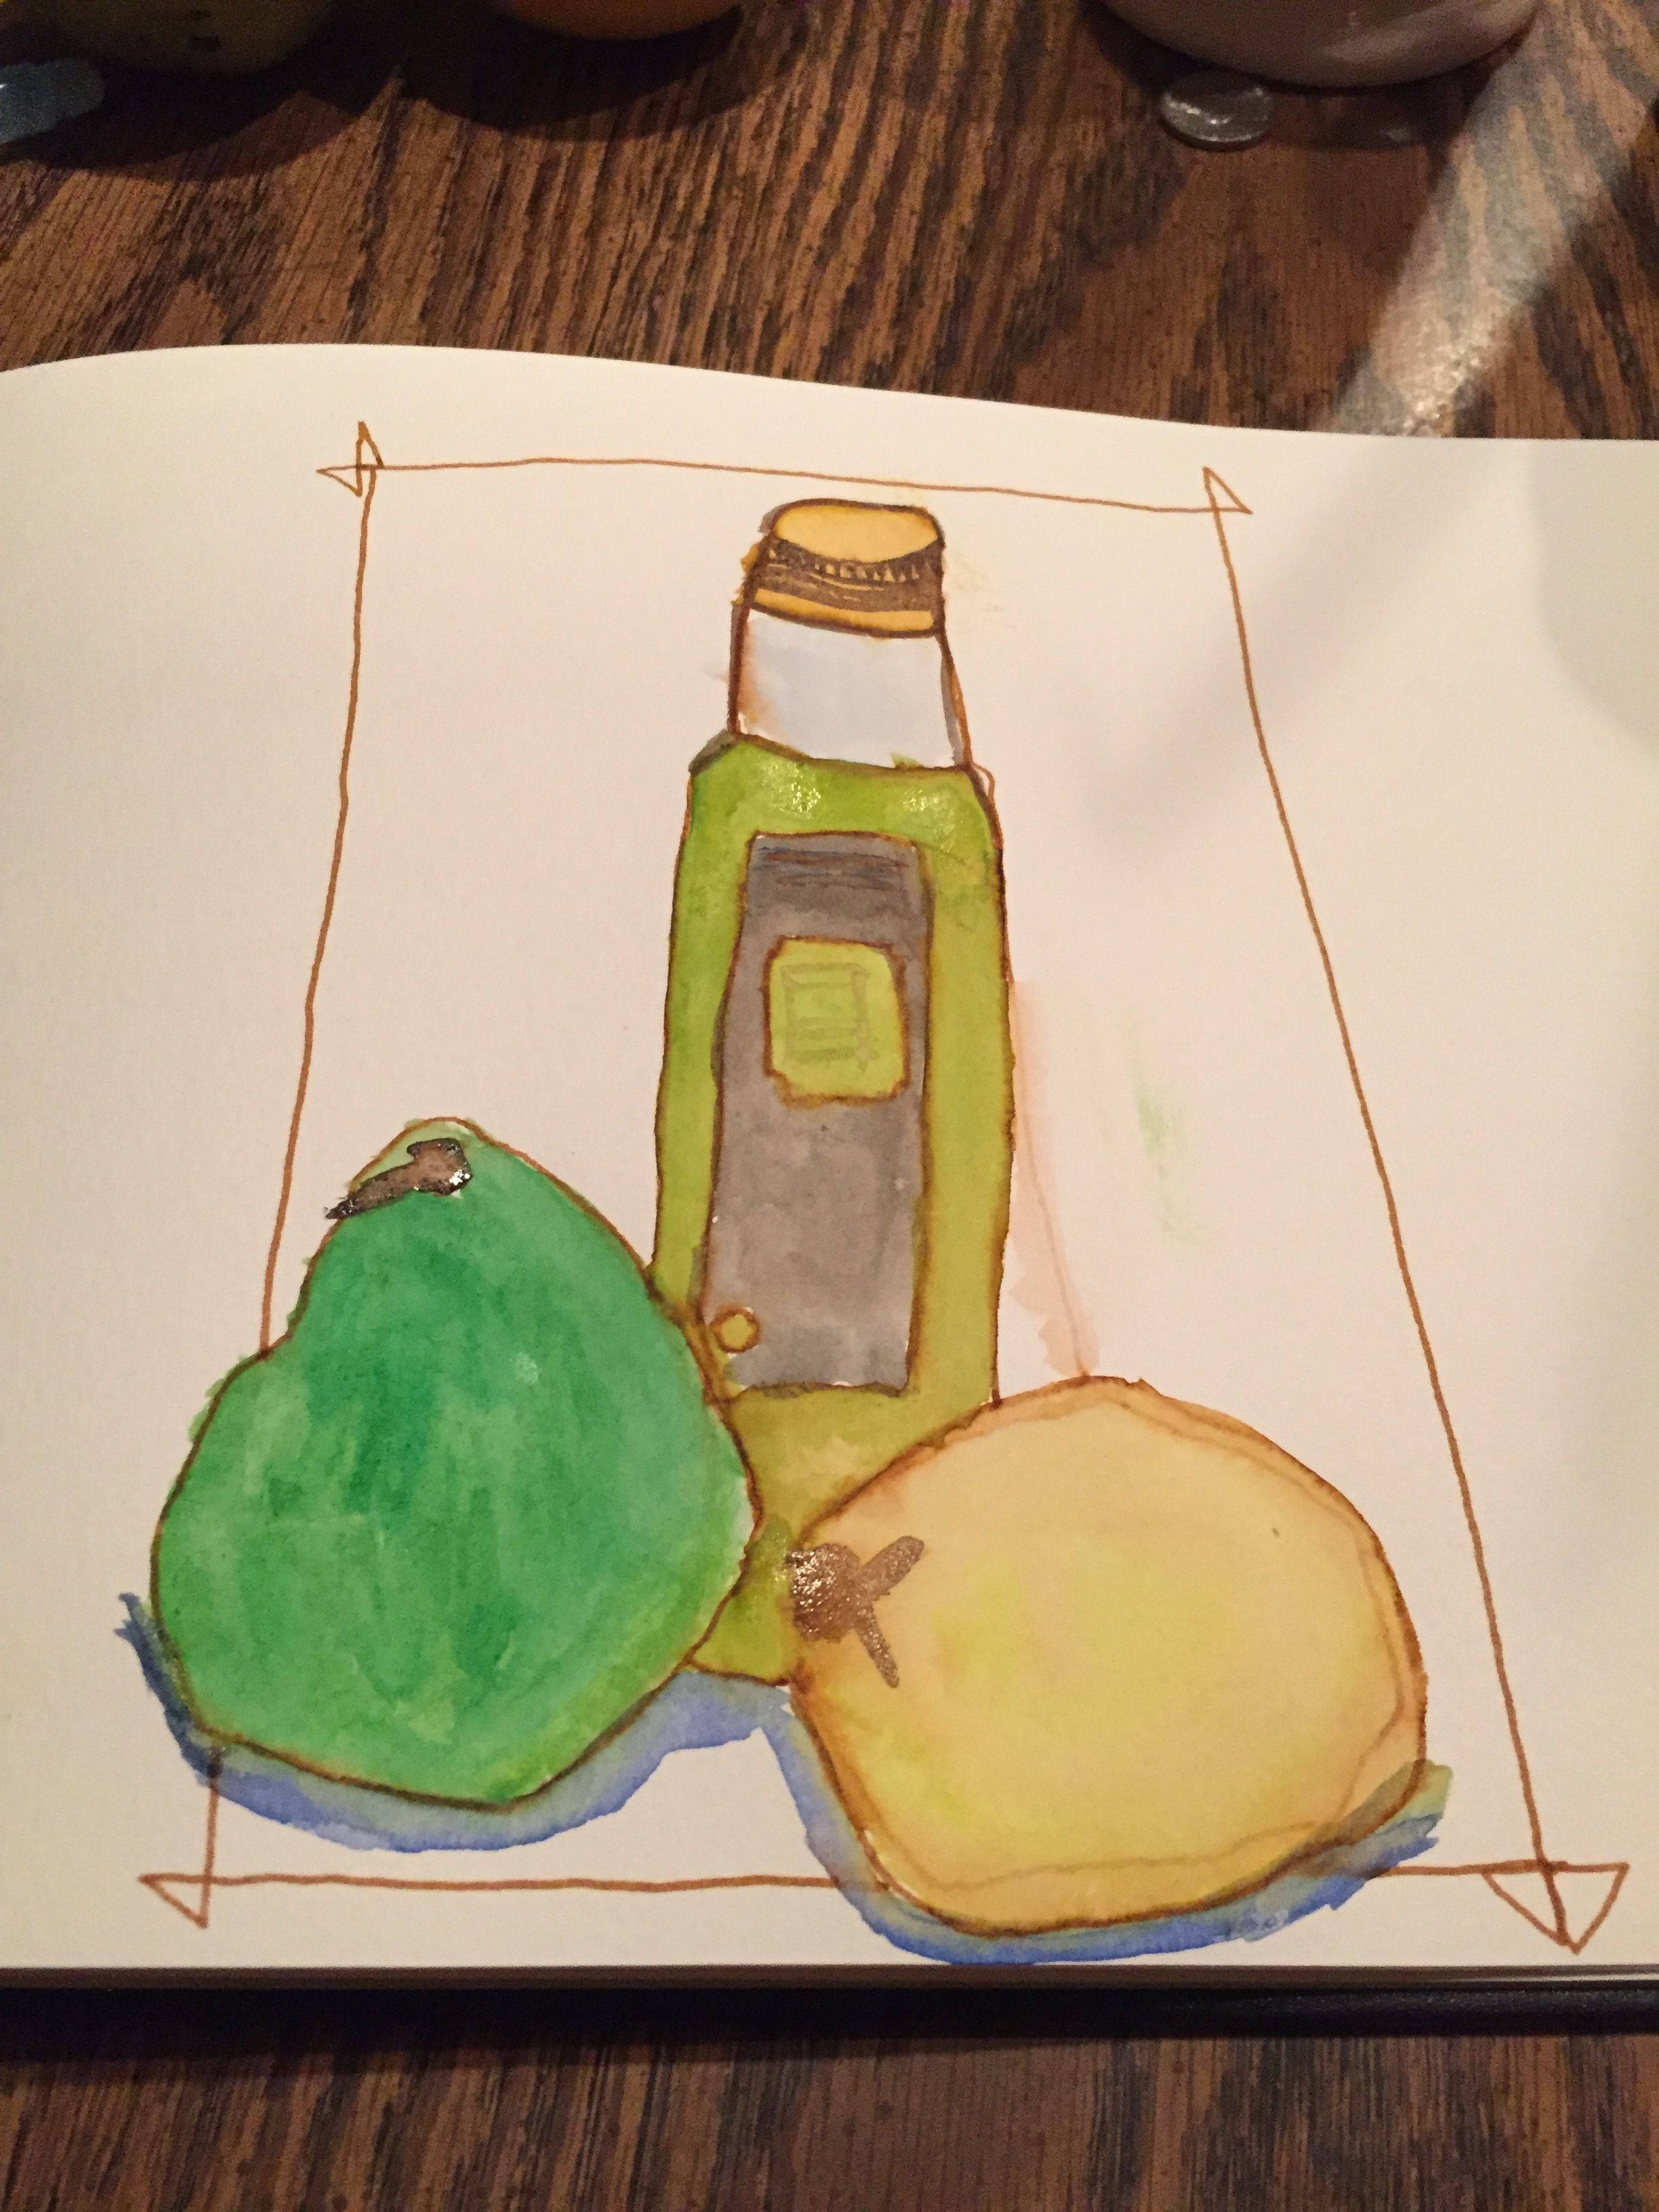 lemon, pear, and bottle of olive oil.